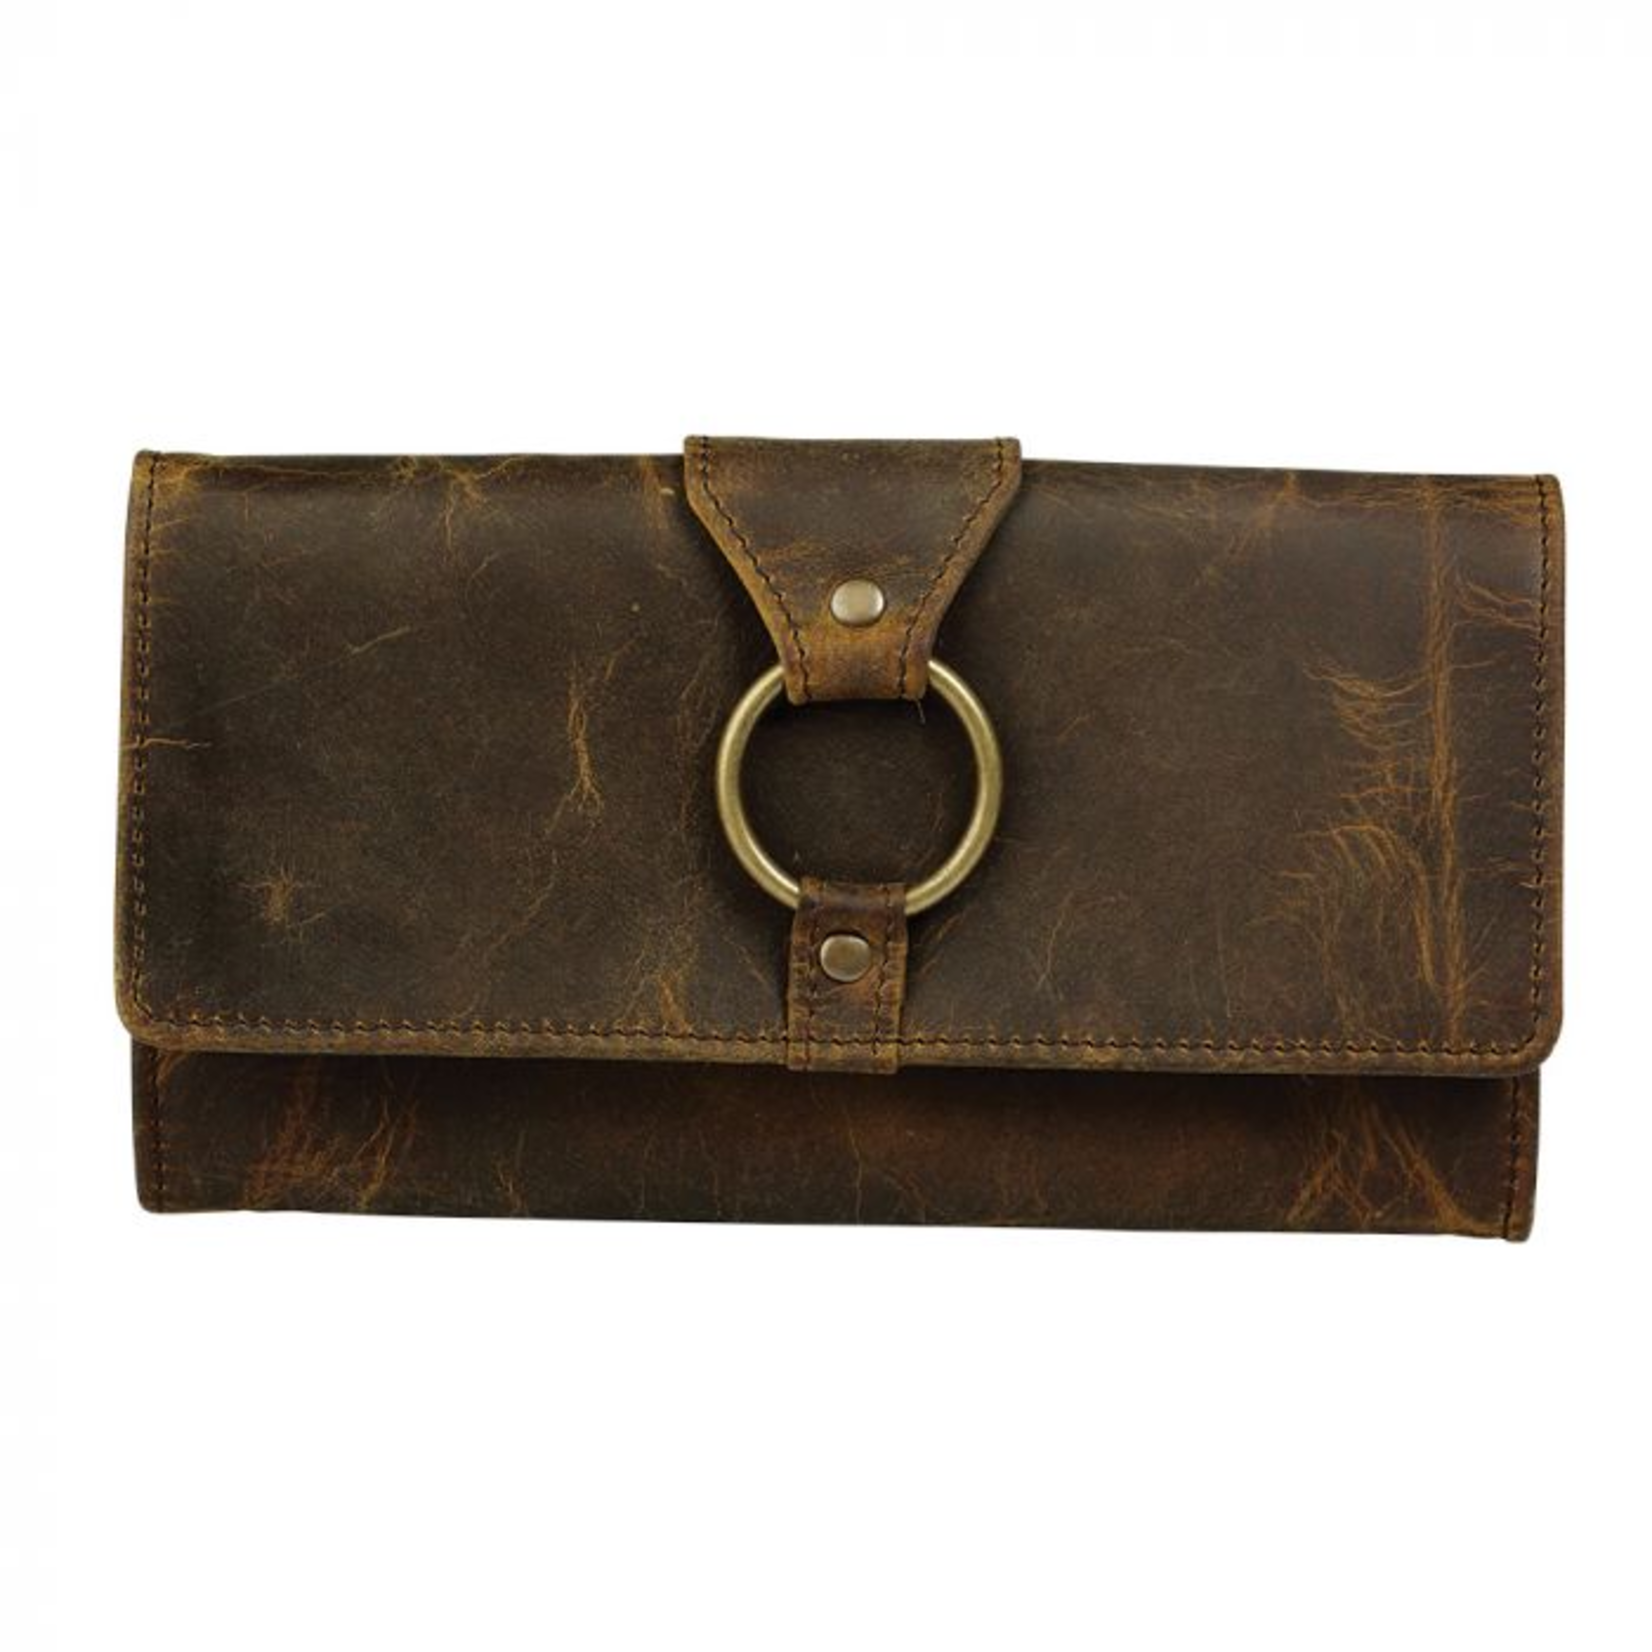 Myra Bag Wallet: Just4Me